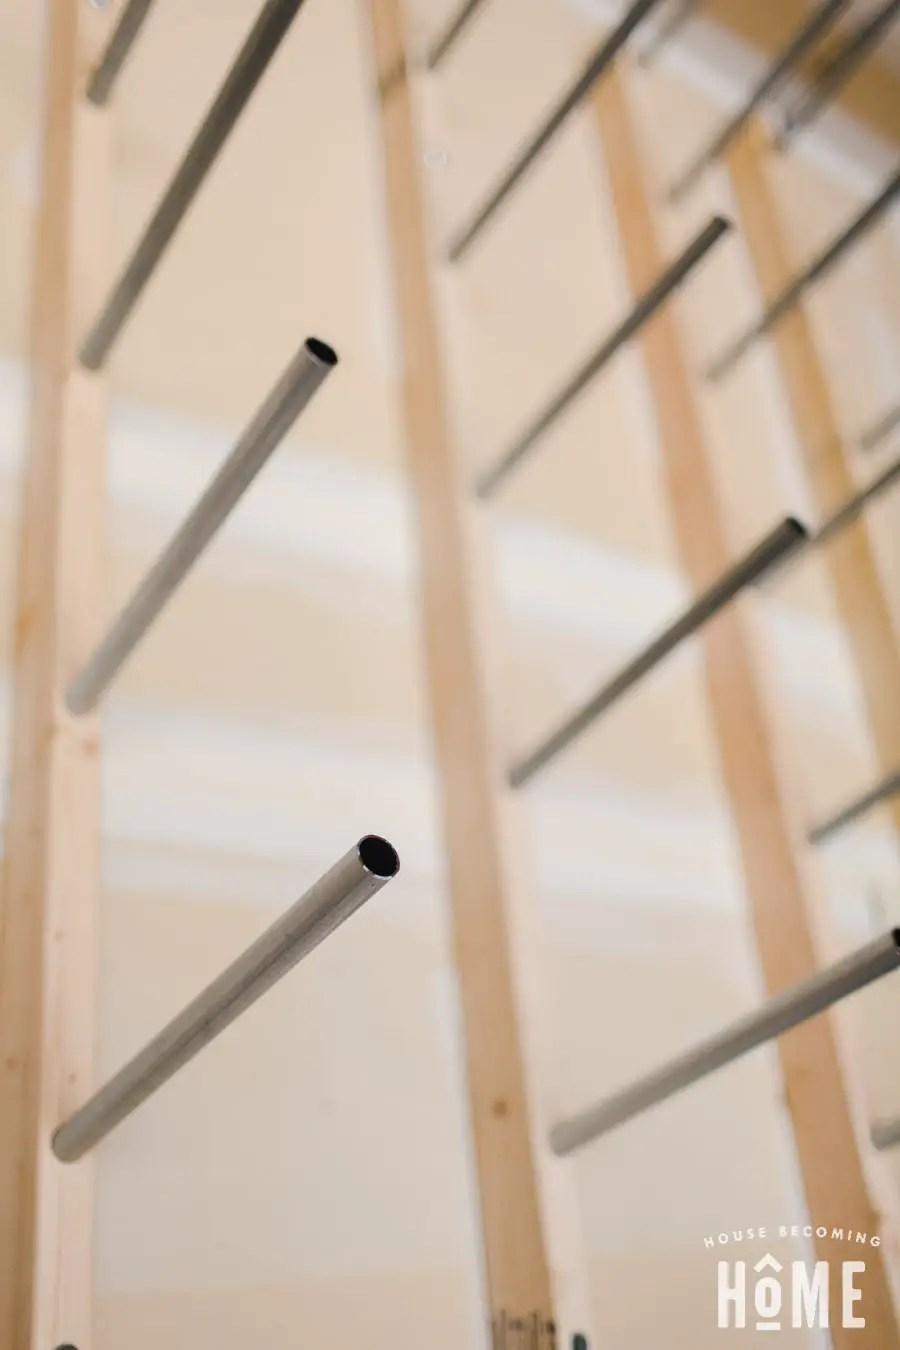 Conduit in Lumber Rack Bottom View